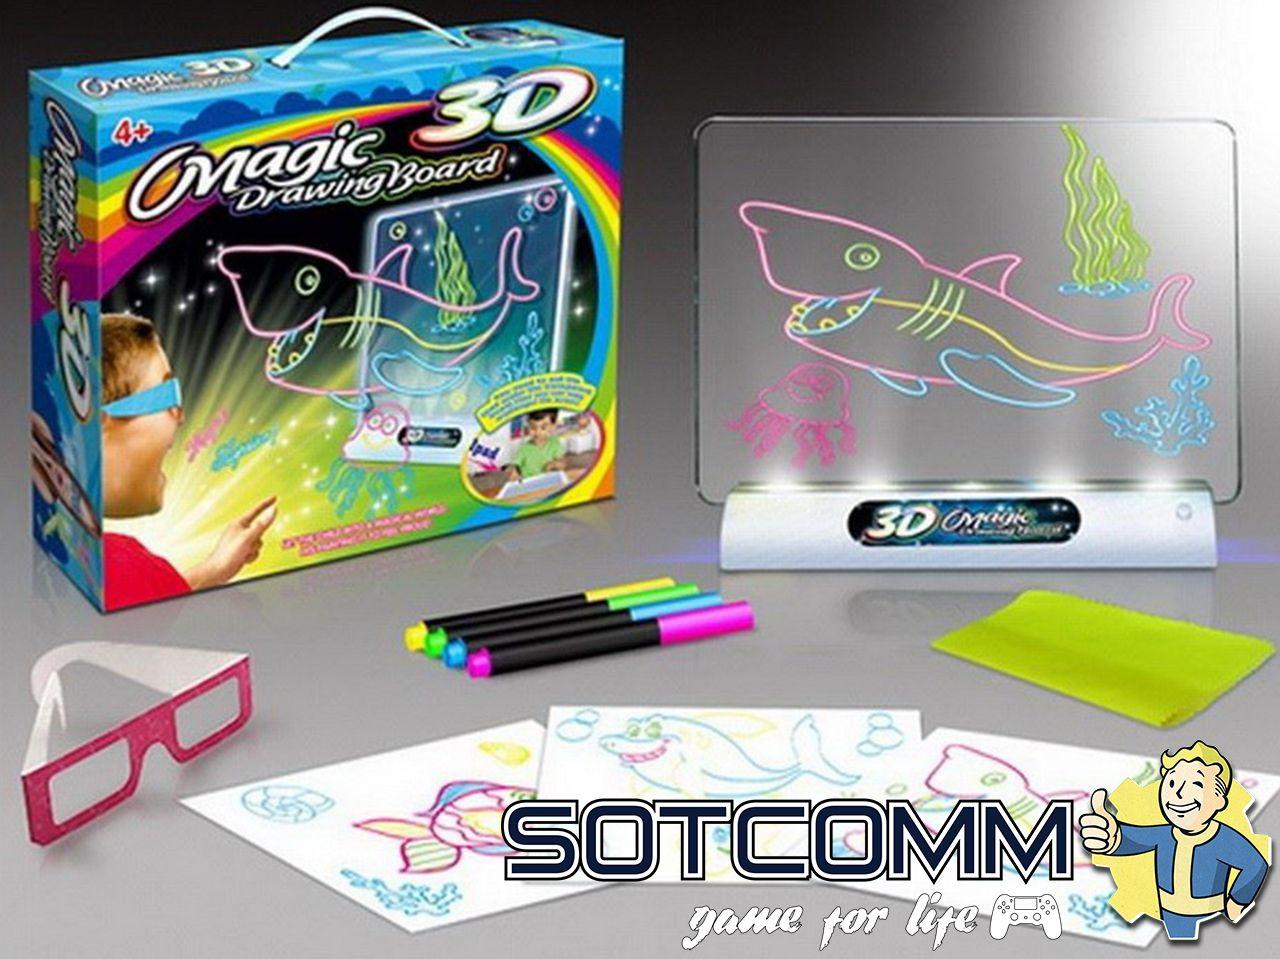 Волшебная доска для рисования с 3D Magic Drawing Board